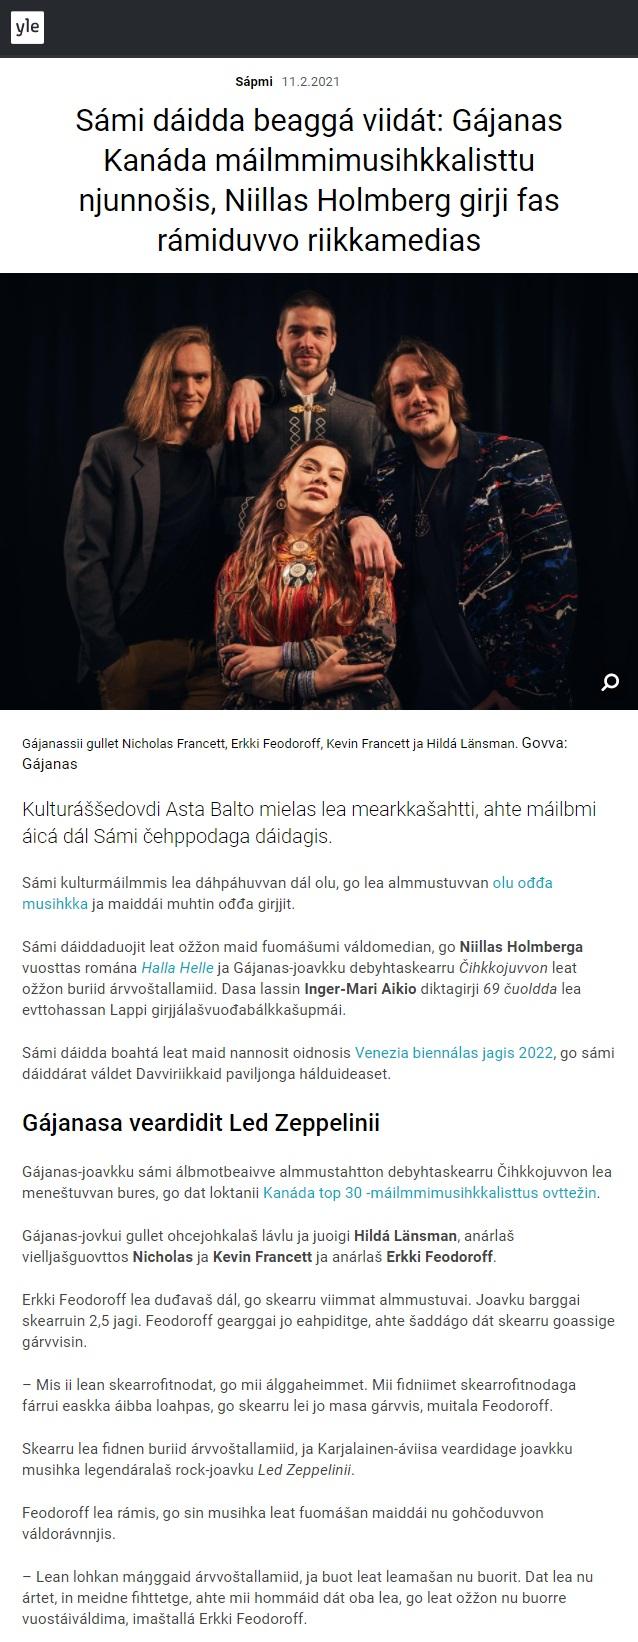 Yle Sápmi (Finland), 11.2.2021